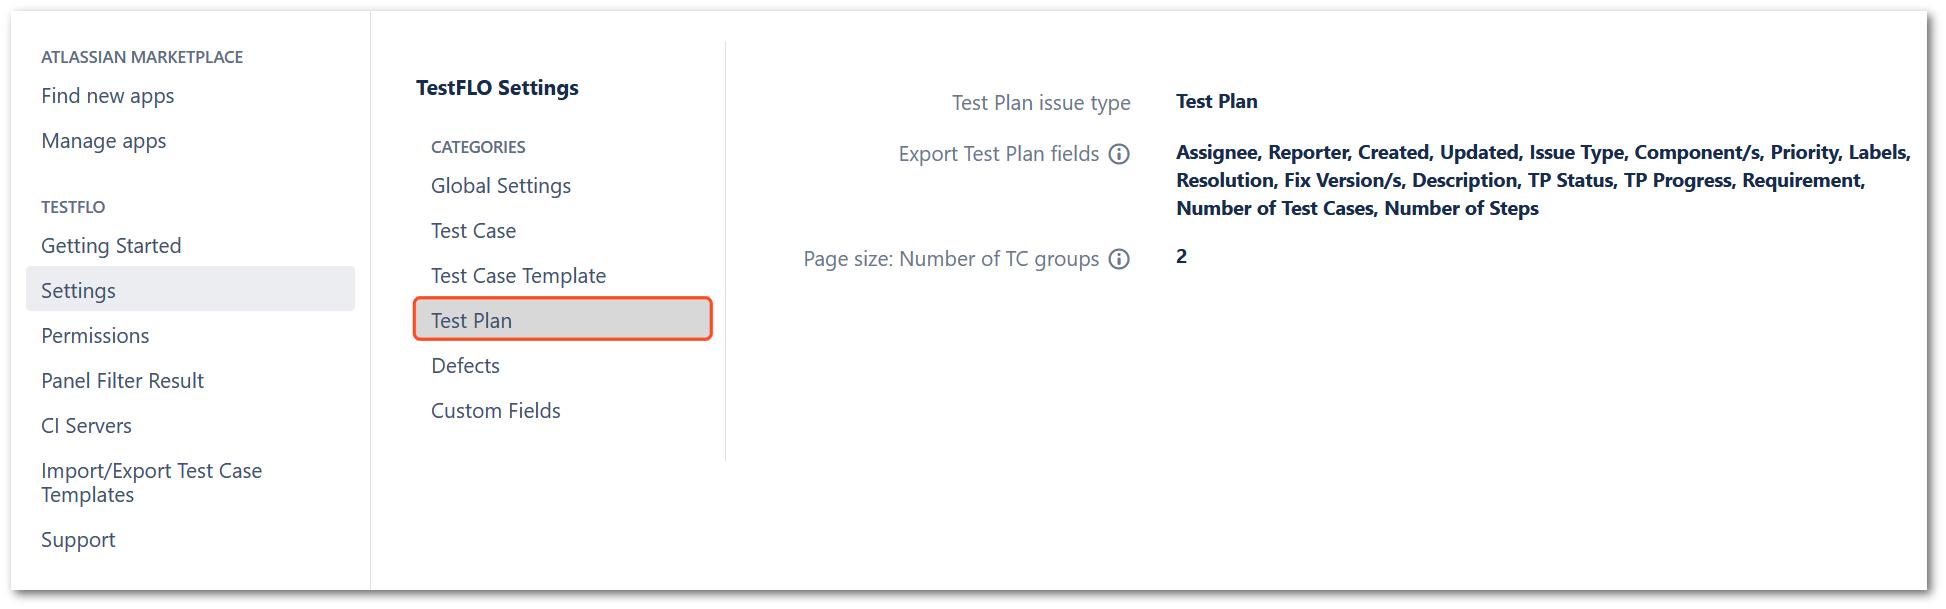 Test Plan section in TestFLO settings